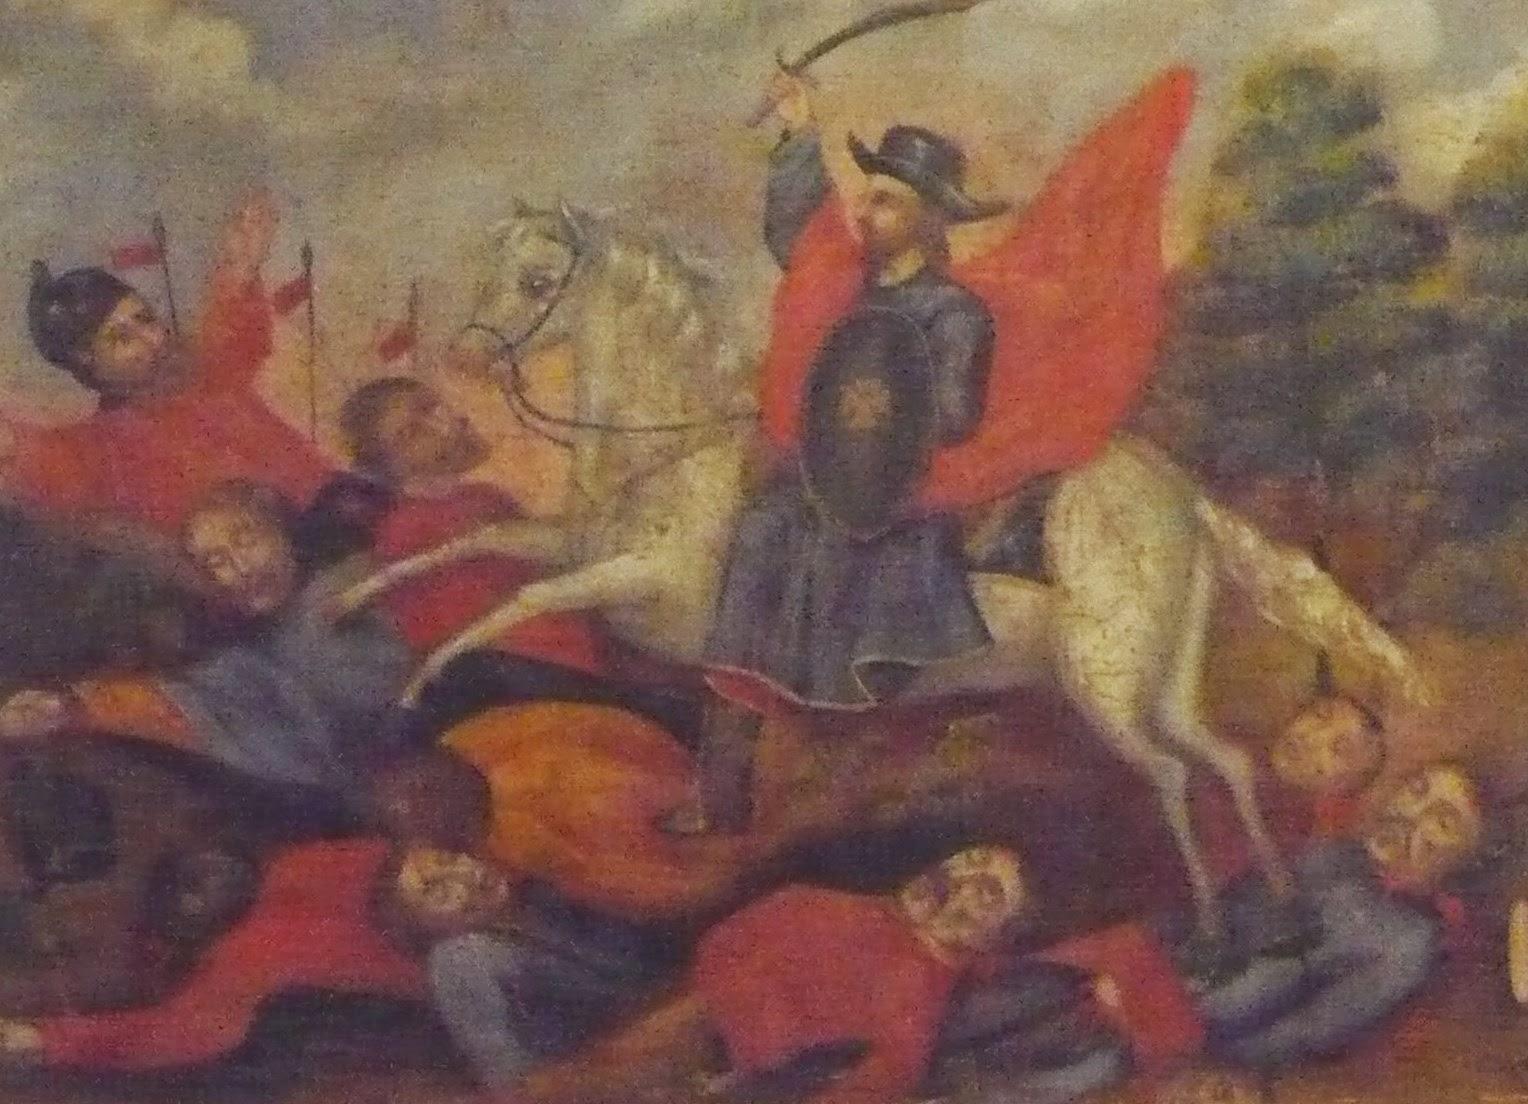 Santiago 'Matapatriotas'